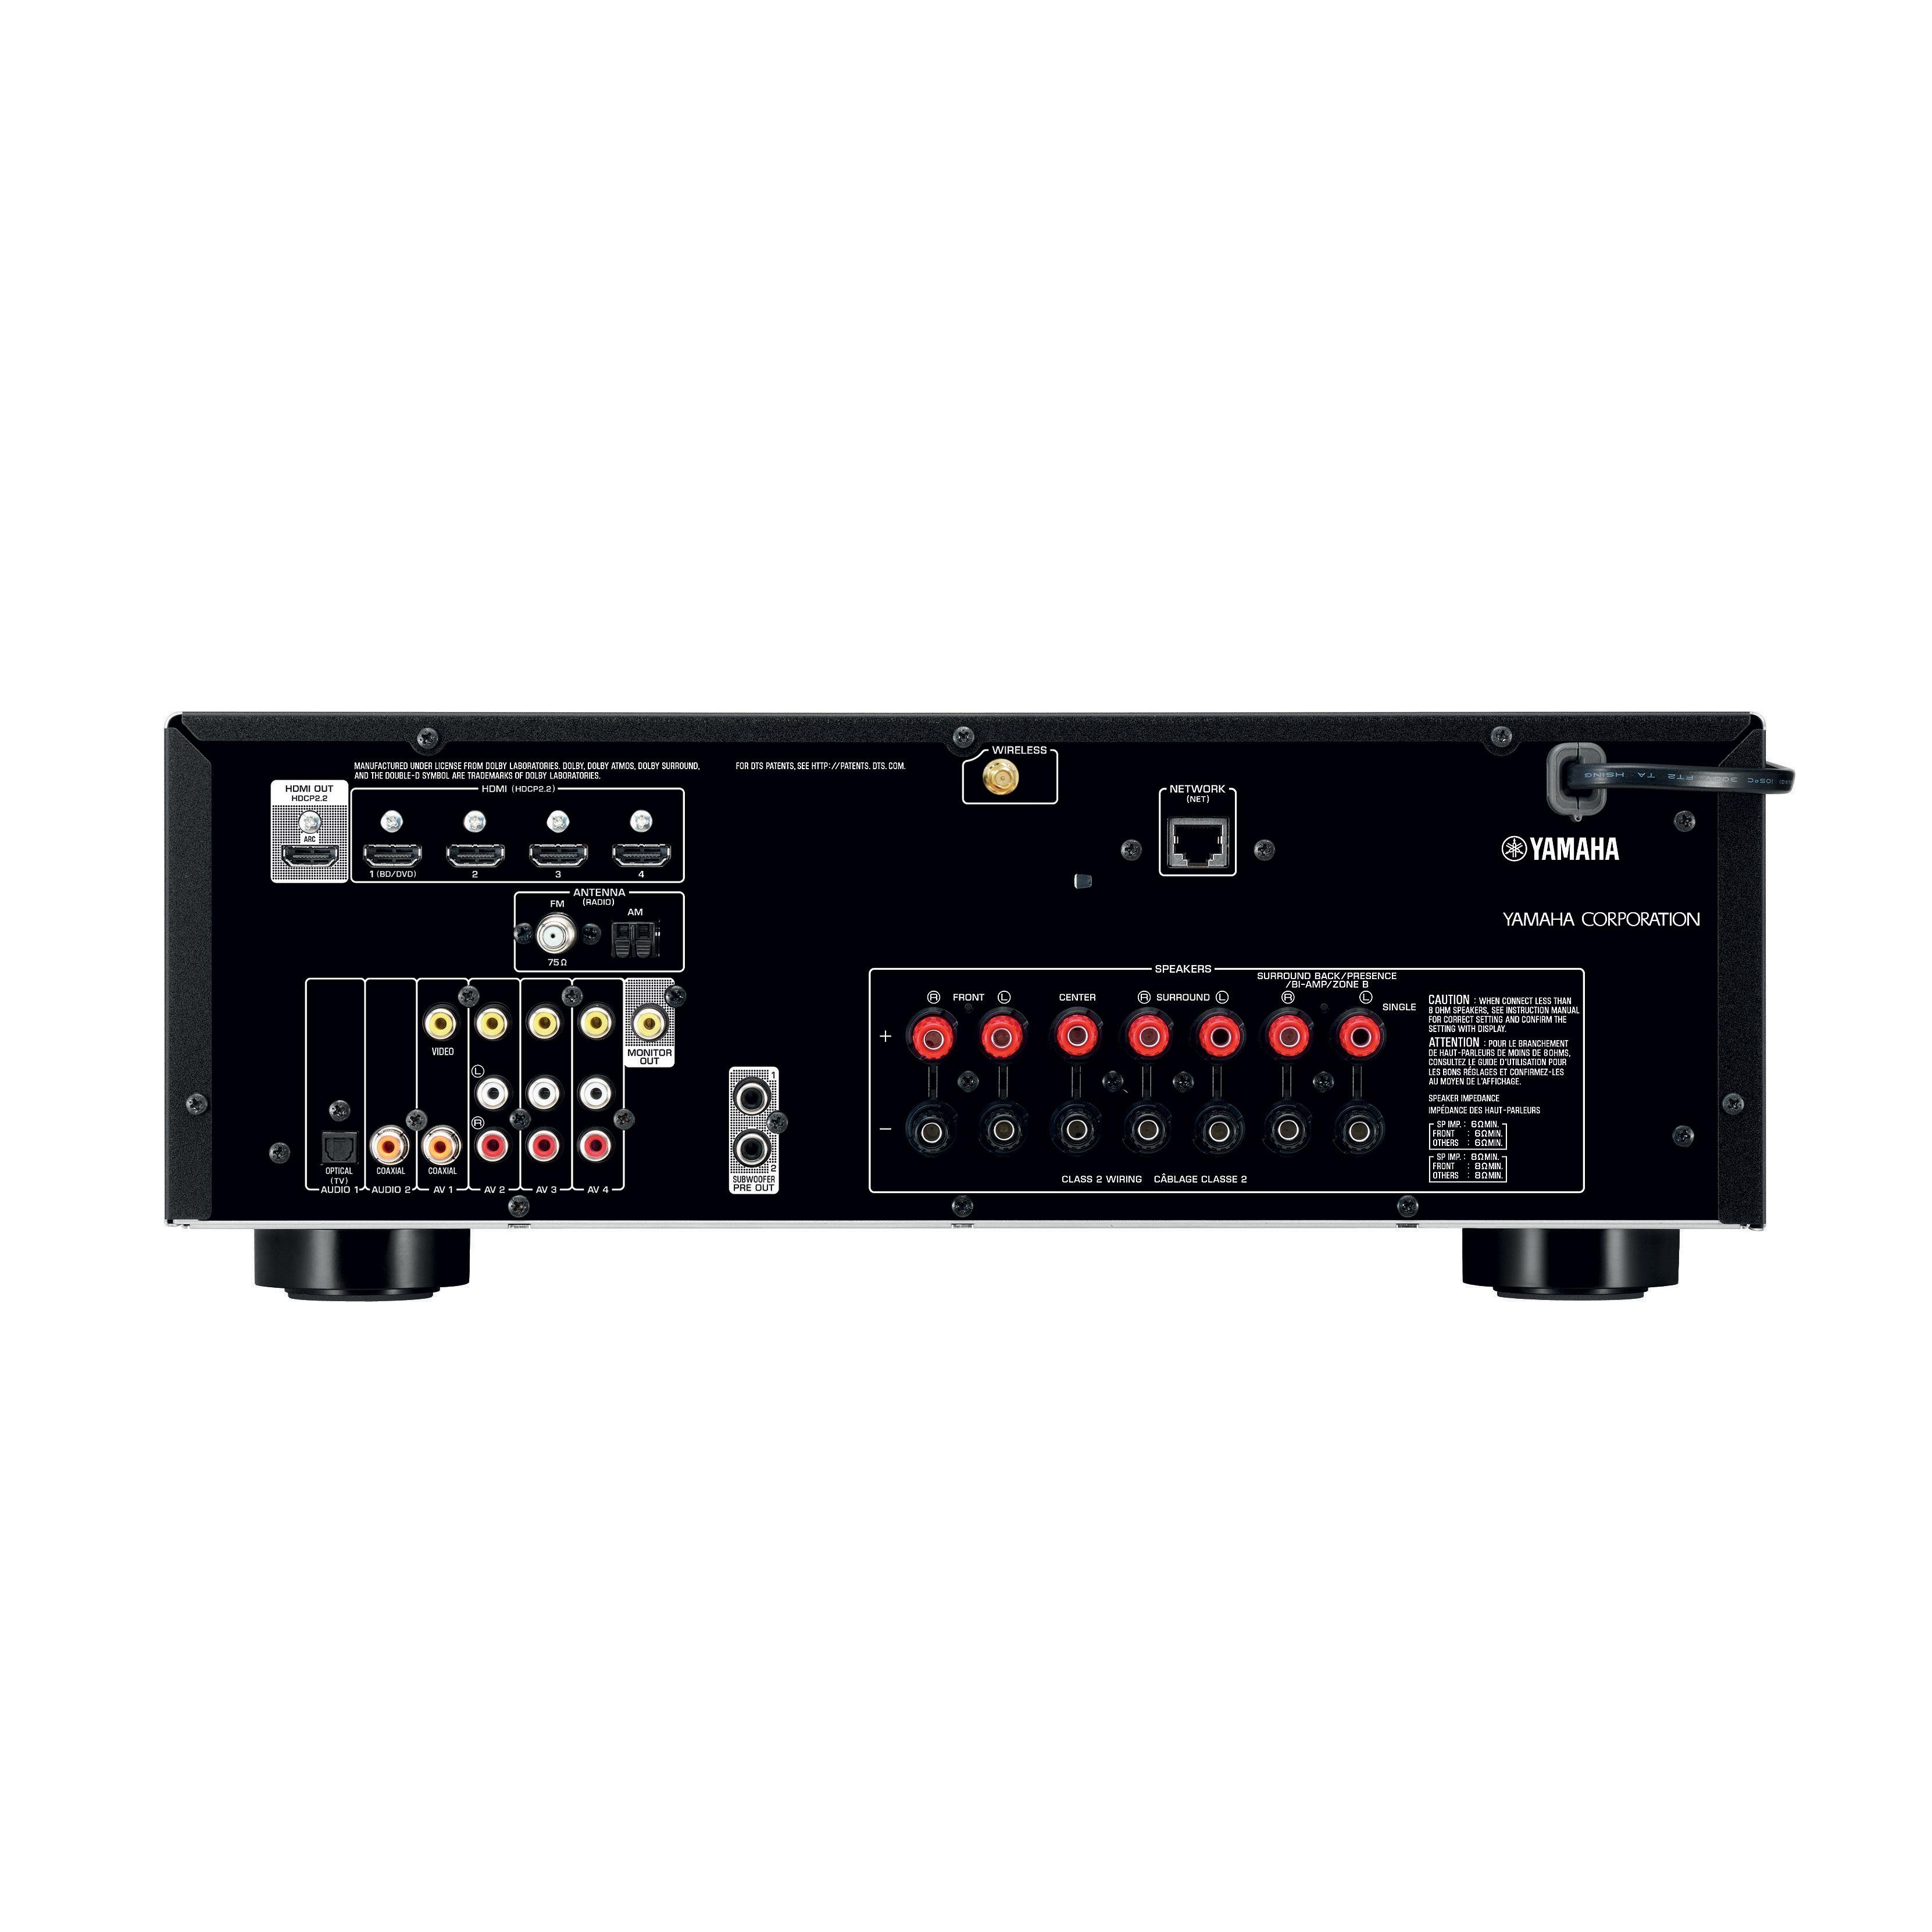 tsr 5810 overview av receivers audio visual products rh usa yamaha com Yamaha Sustain Pedal yamaha rx-v367 manual download